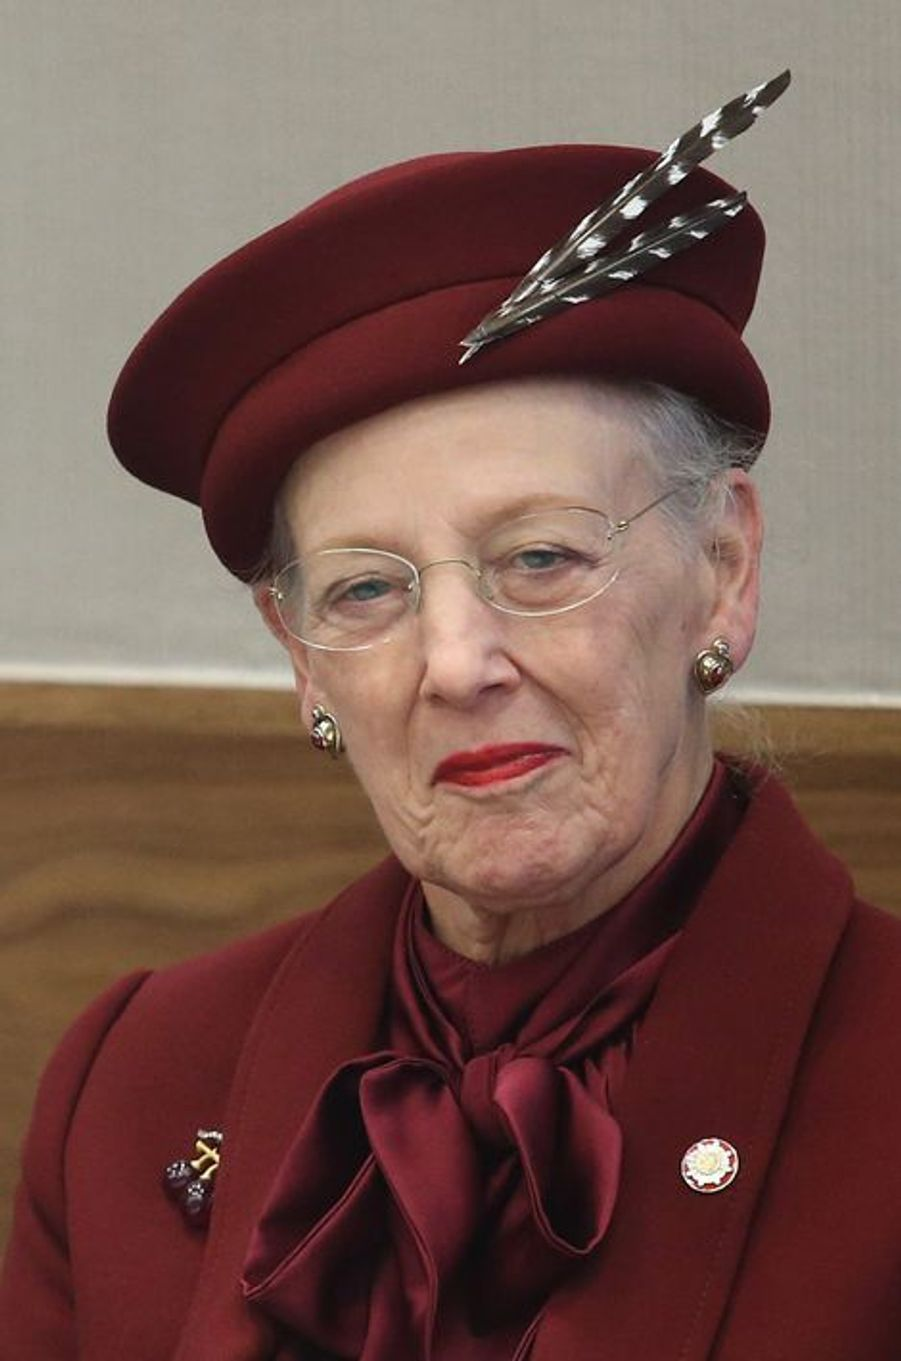 La reine Margrethe II de Danemark, le 22 octobre 2014